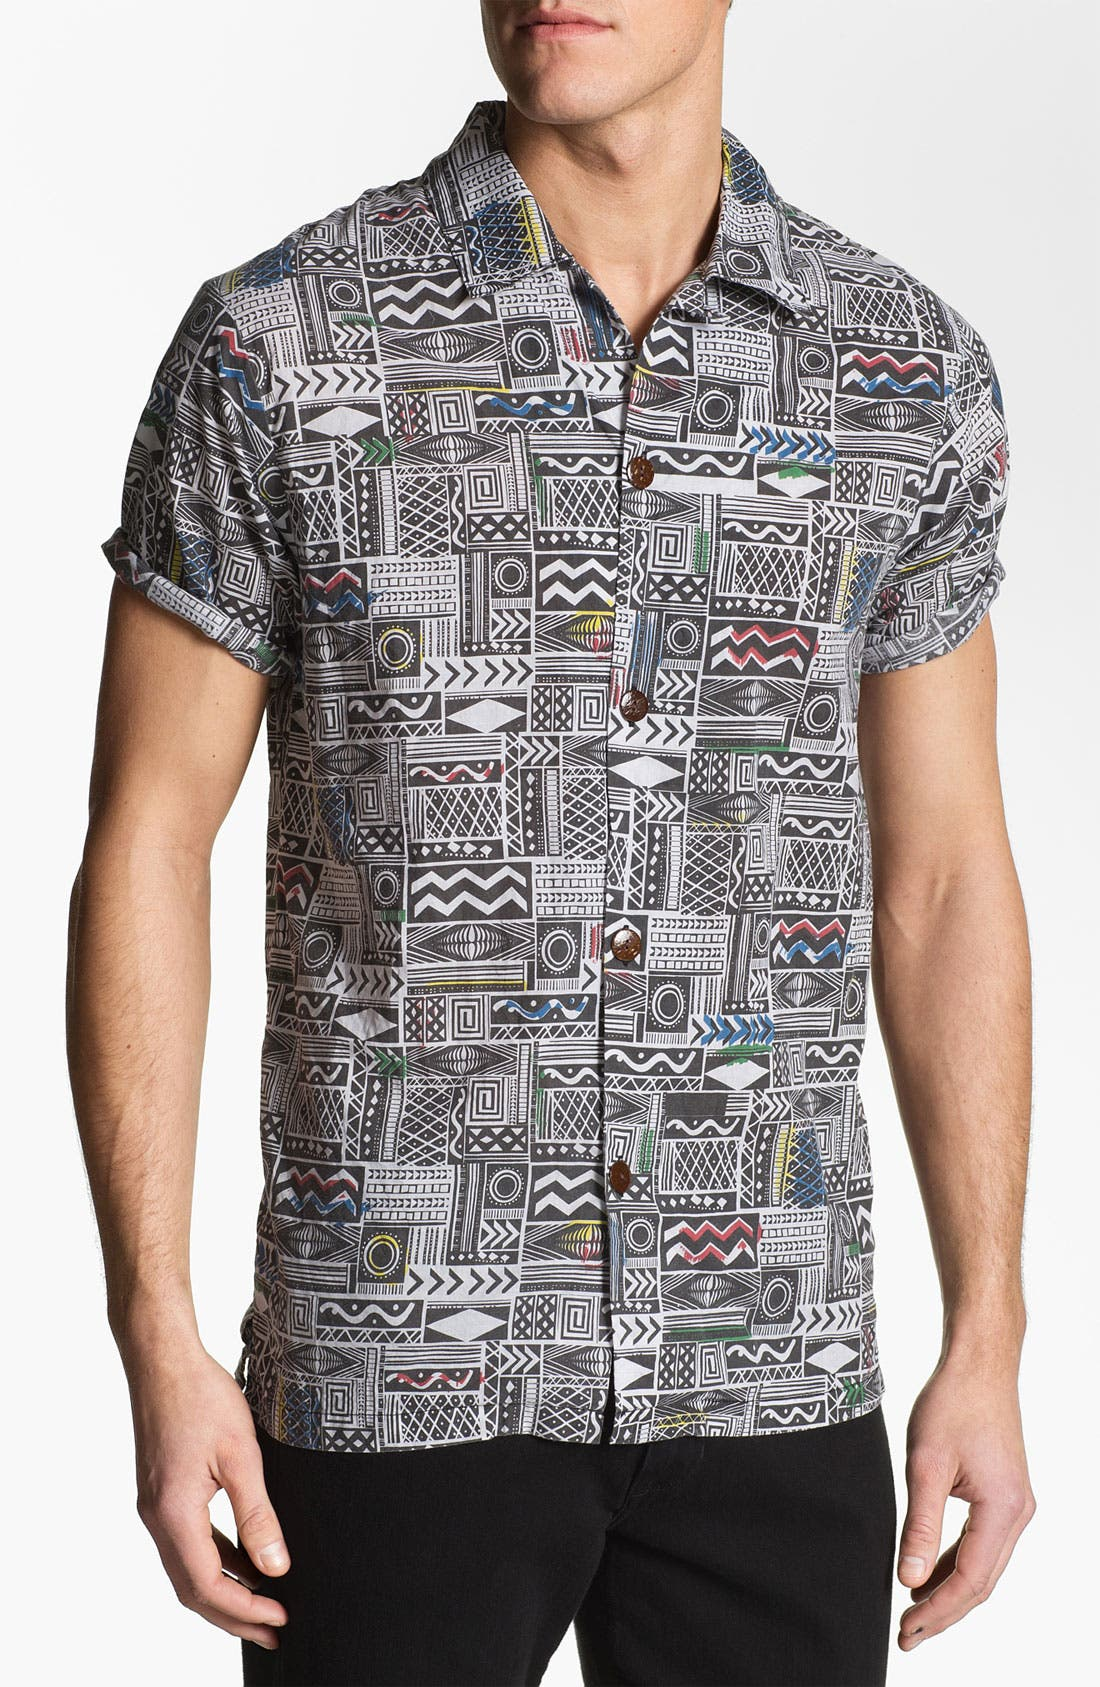 Alternate Image 1 Selected - Vanguard 'Sonic Jungle' Print Woven Shirt